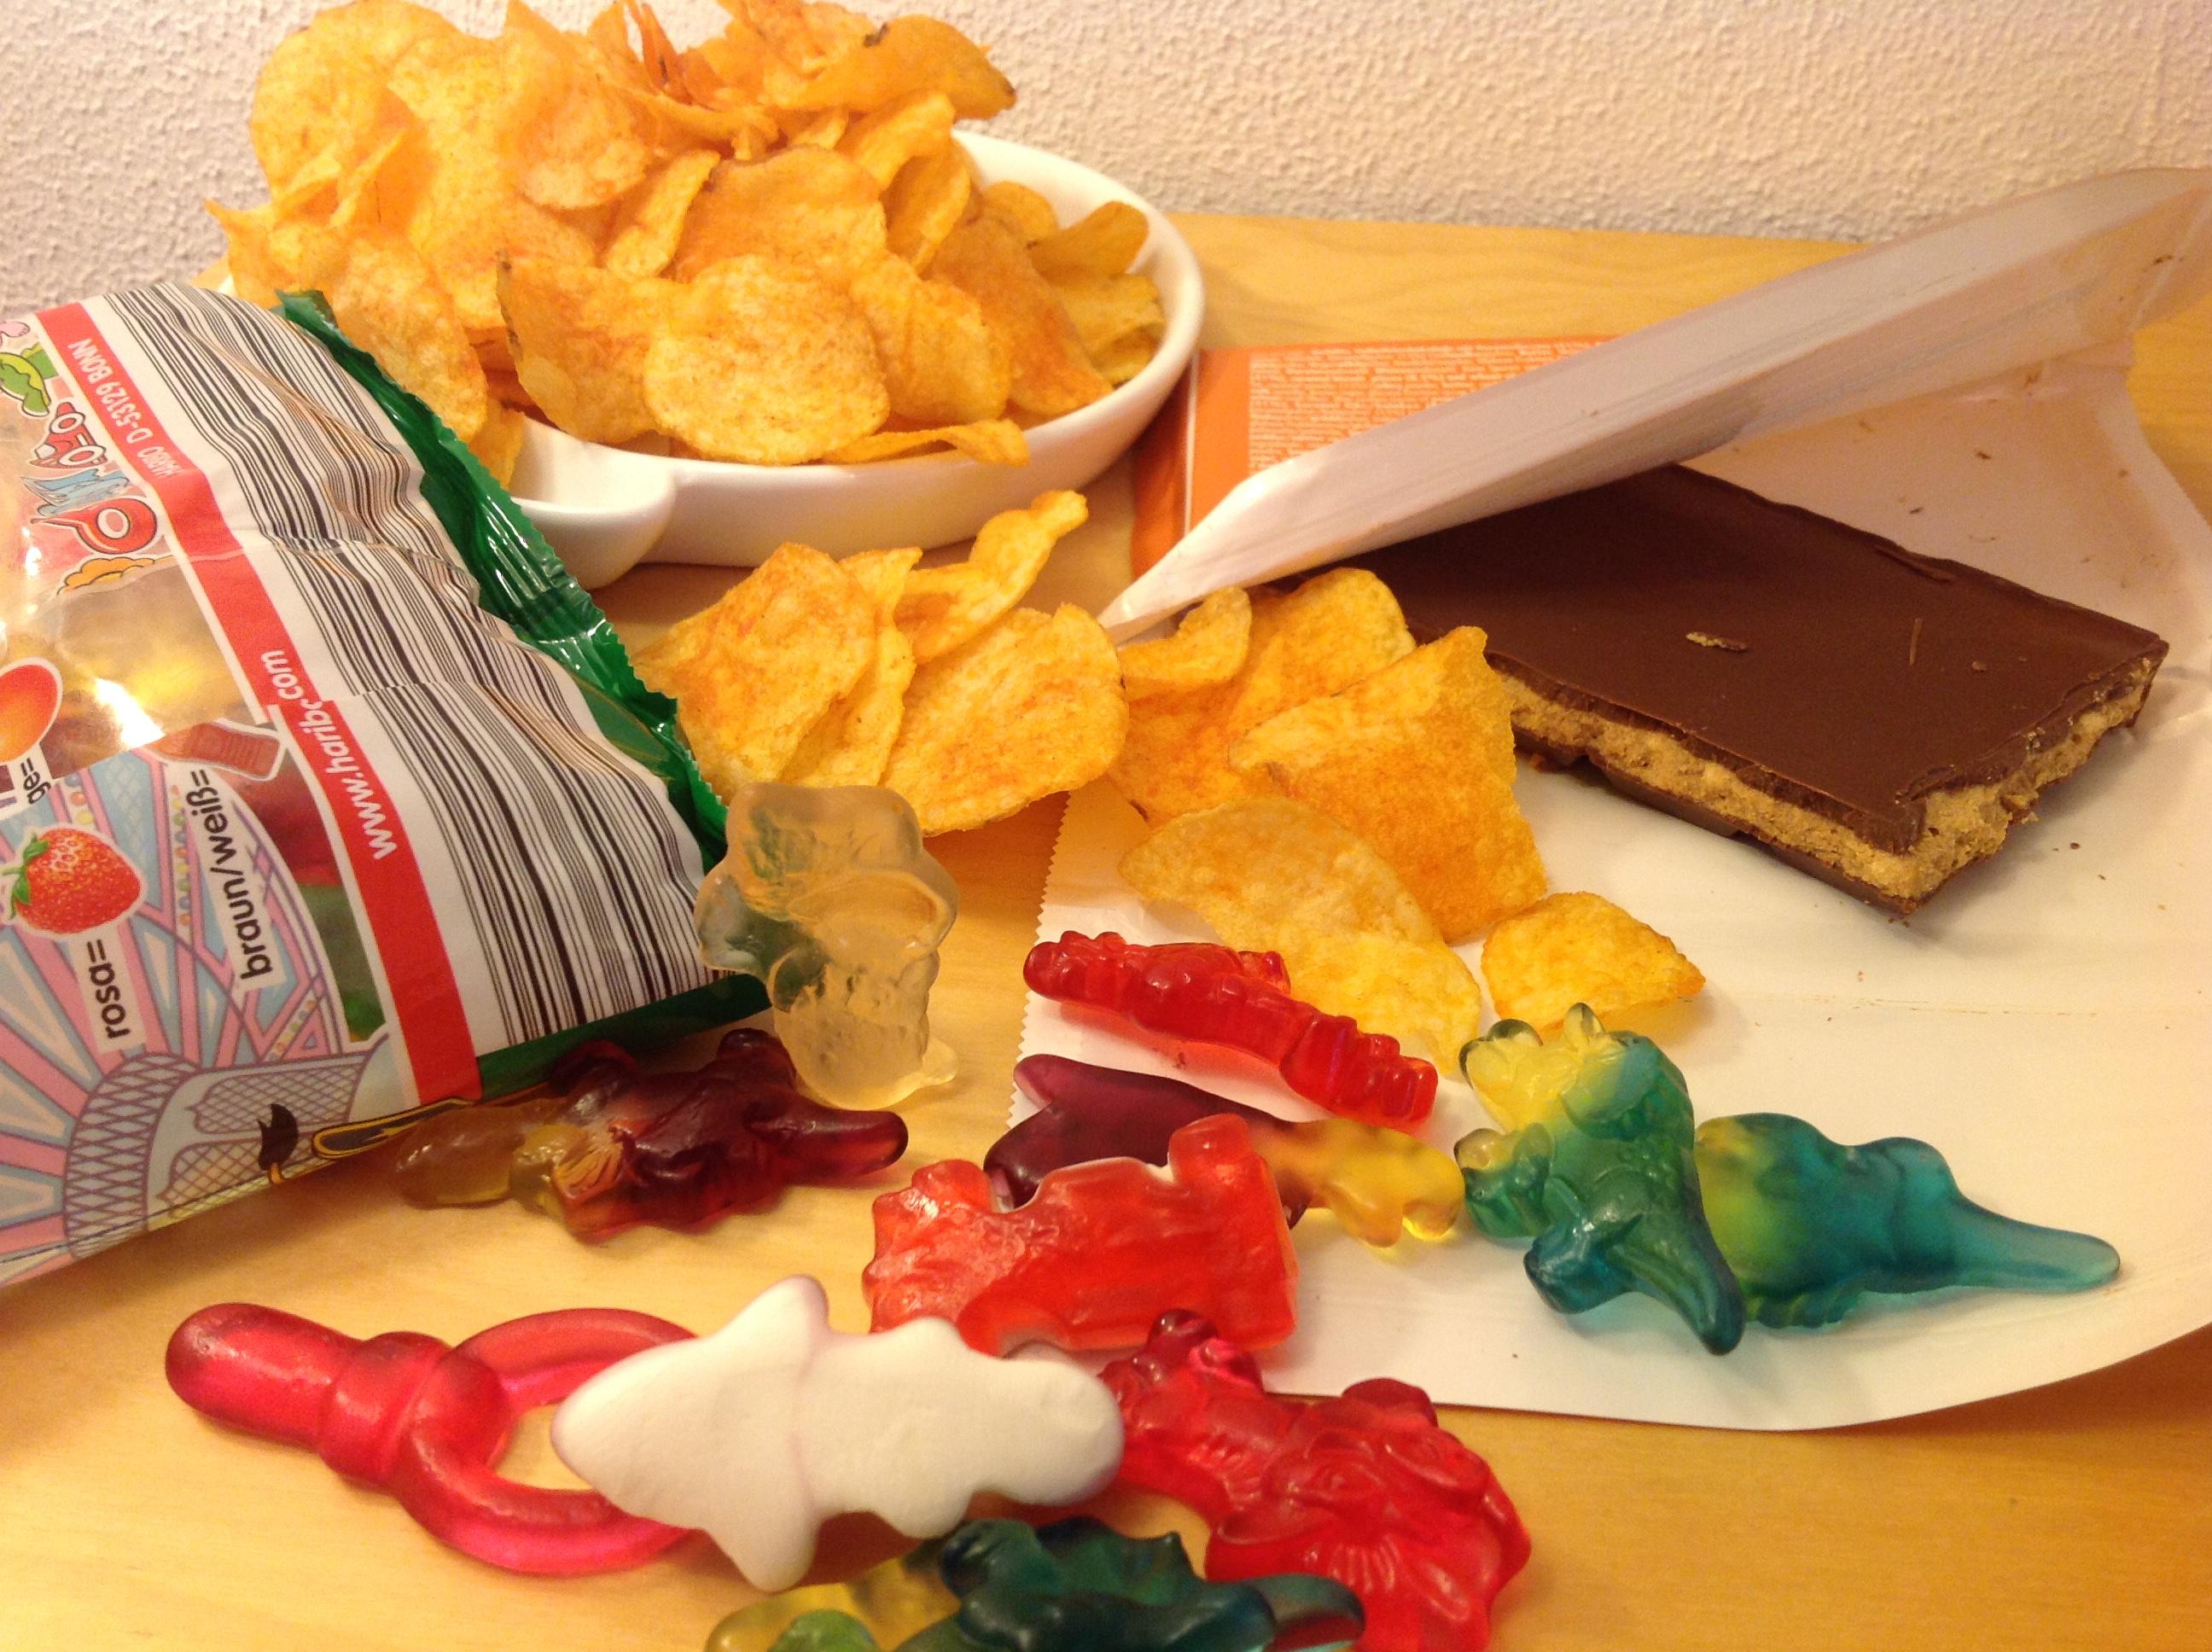 Süßigkeiten ausmisten!